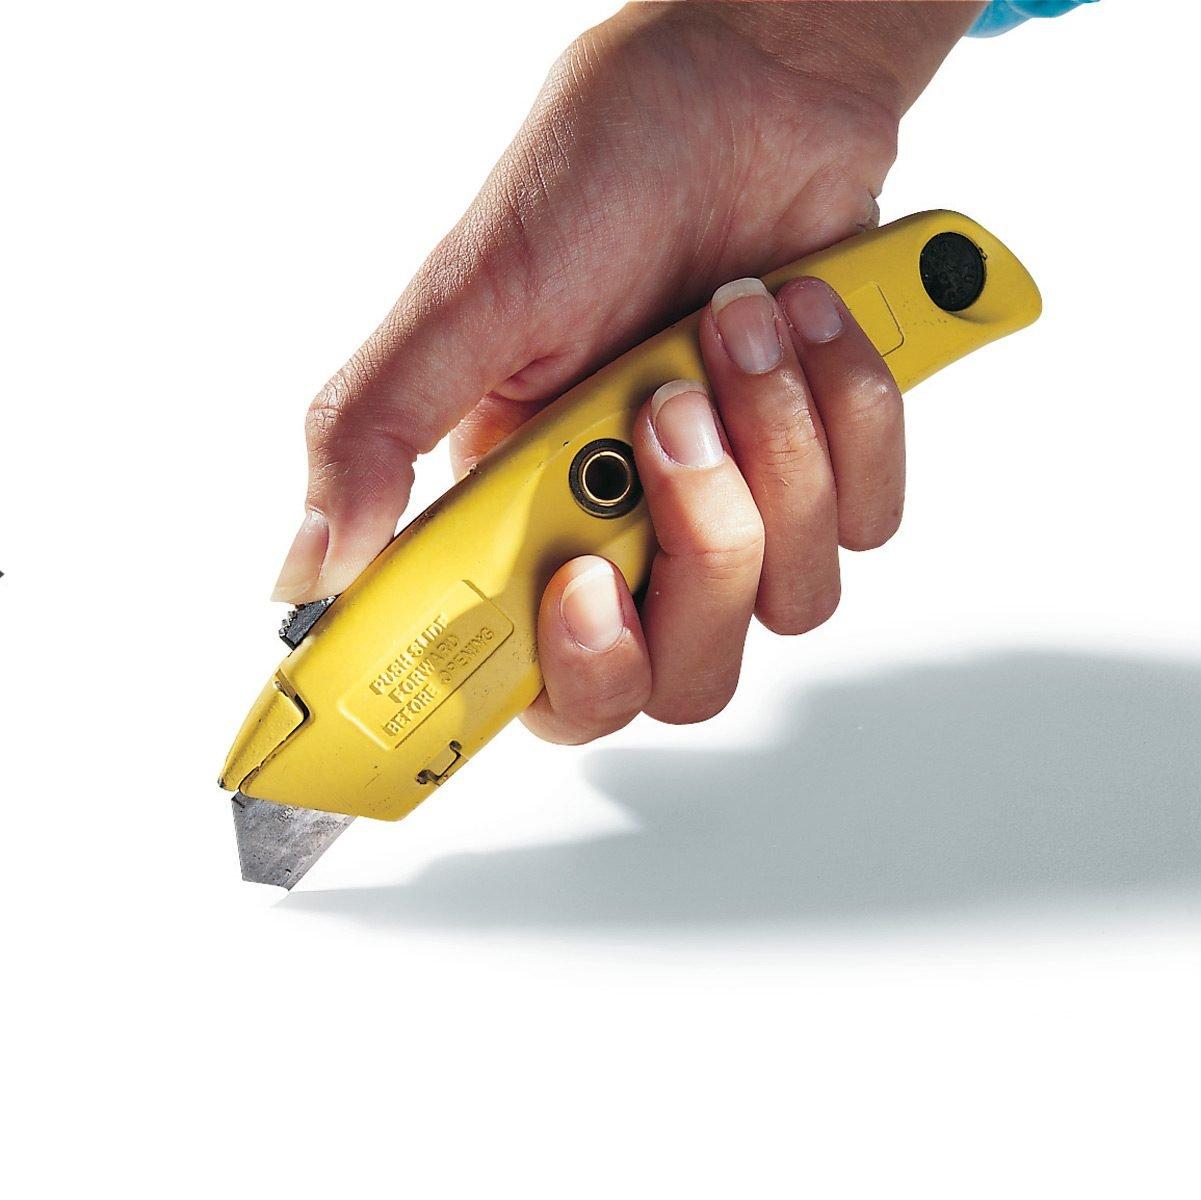 Finger Saver Plus Multi Tool Drywall Construction